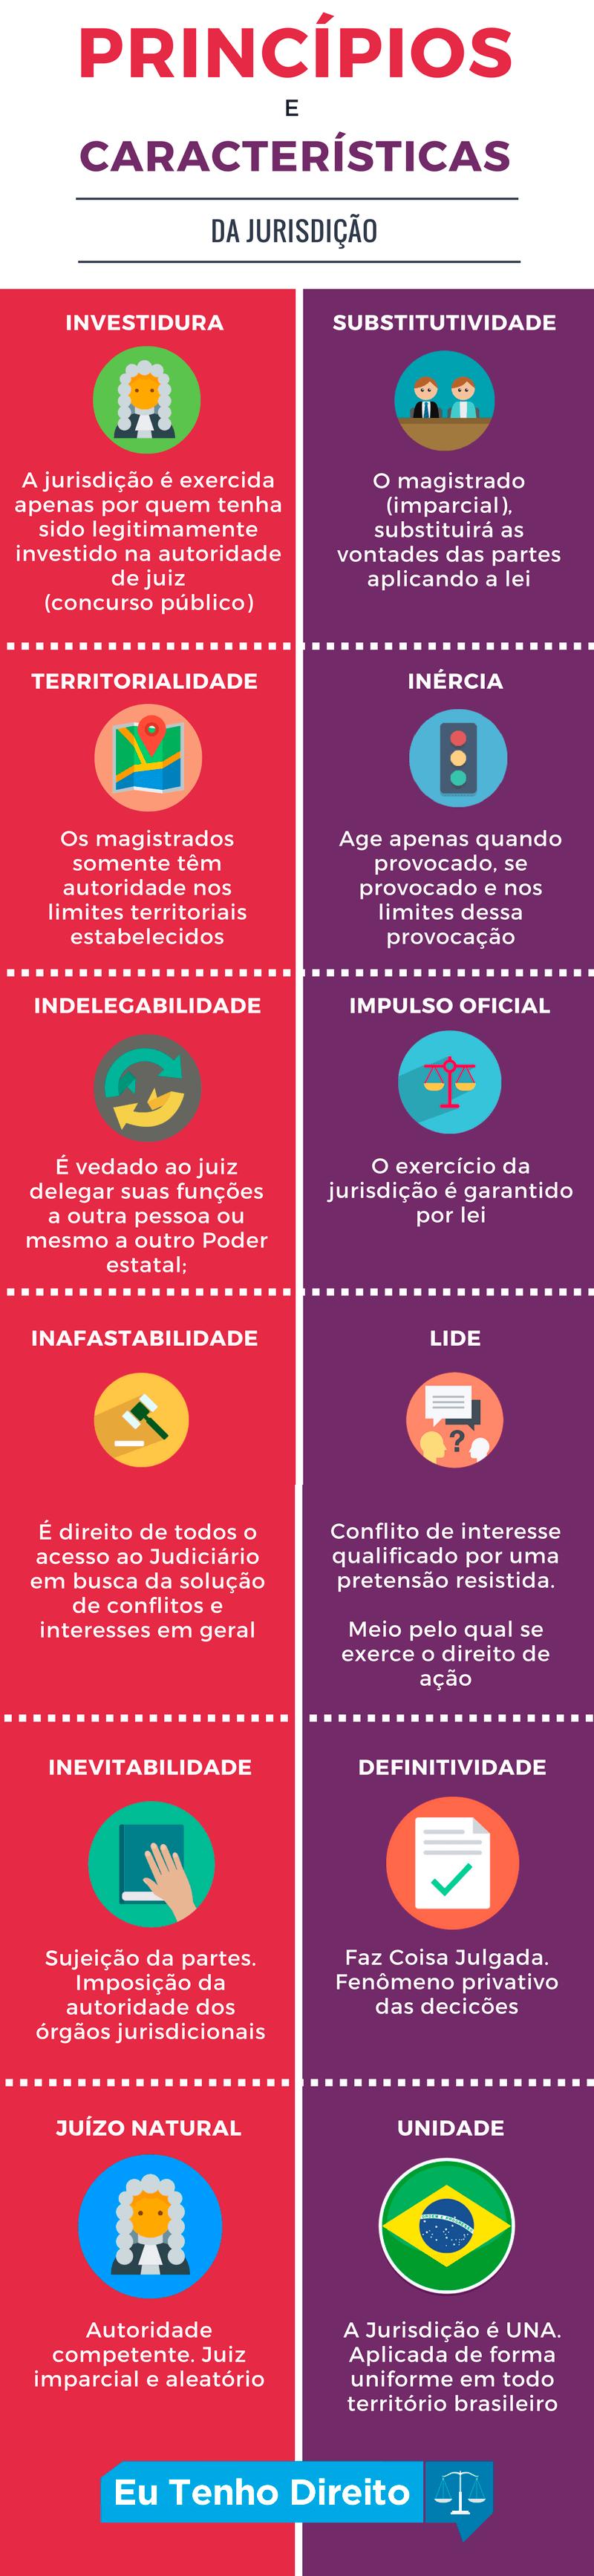 Jurisdicao-principios-caracteristicas-novo-cpc